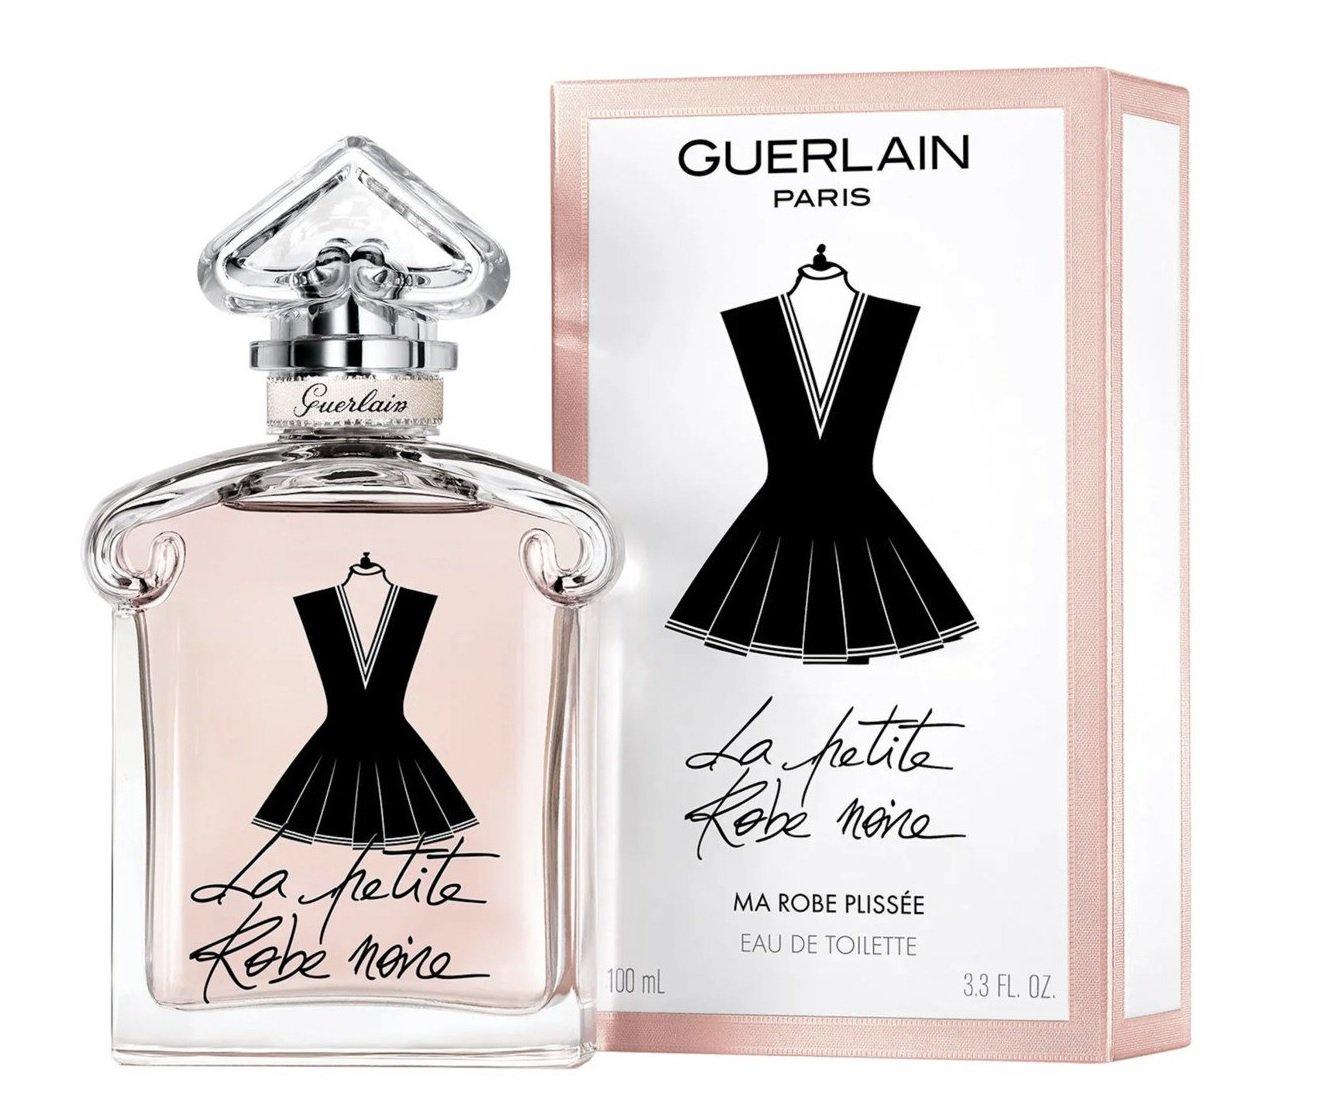 Guerlain-La-Petite-Robe-Noire-Ma-Robe-Plissée-Box-Flacon.jpg